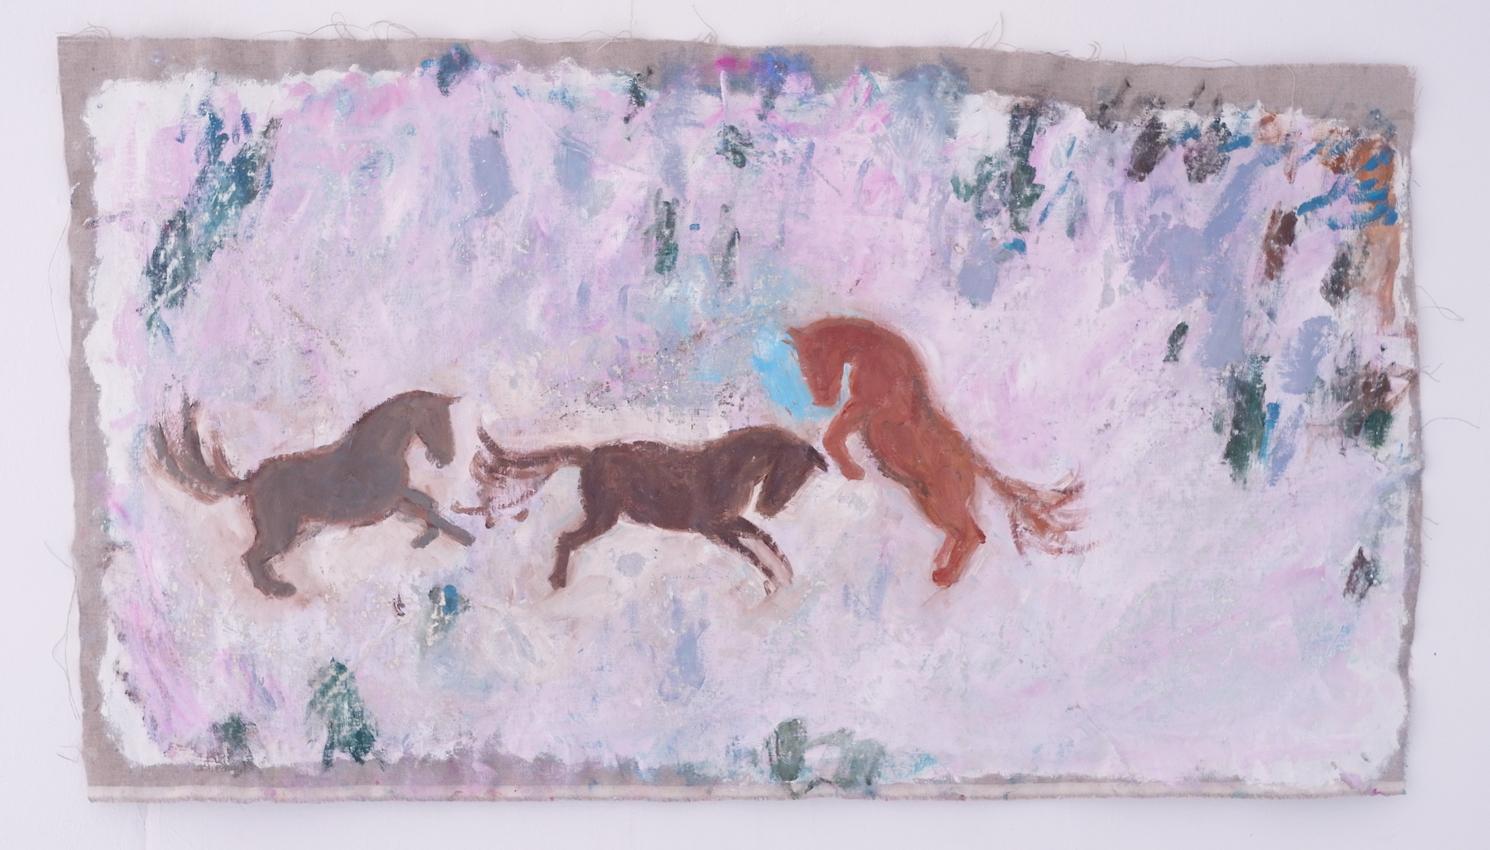 Franziska Güttler, Drei Pferde, Öl auf Leinen, 68x118 cm, 2021